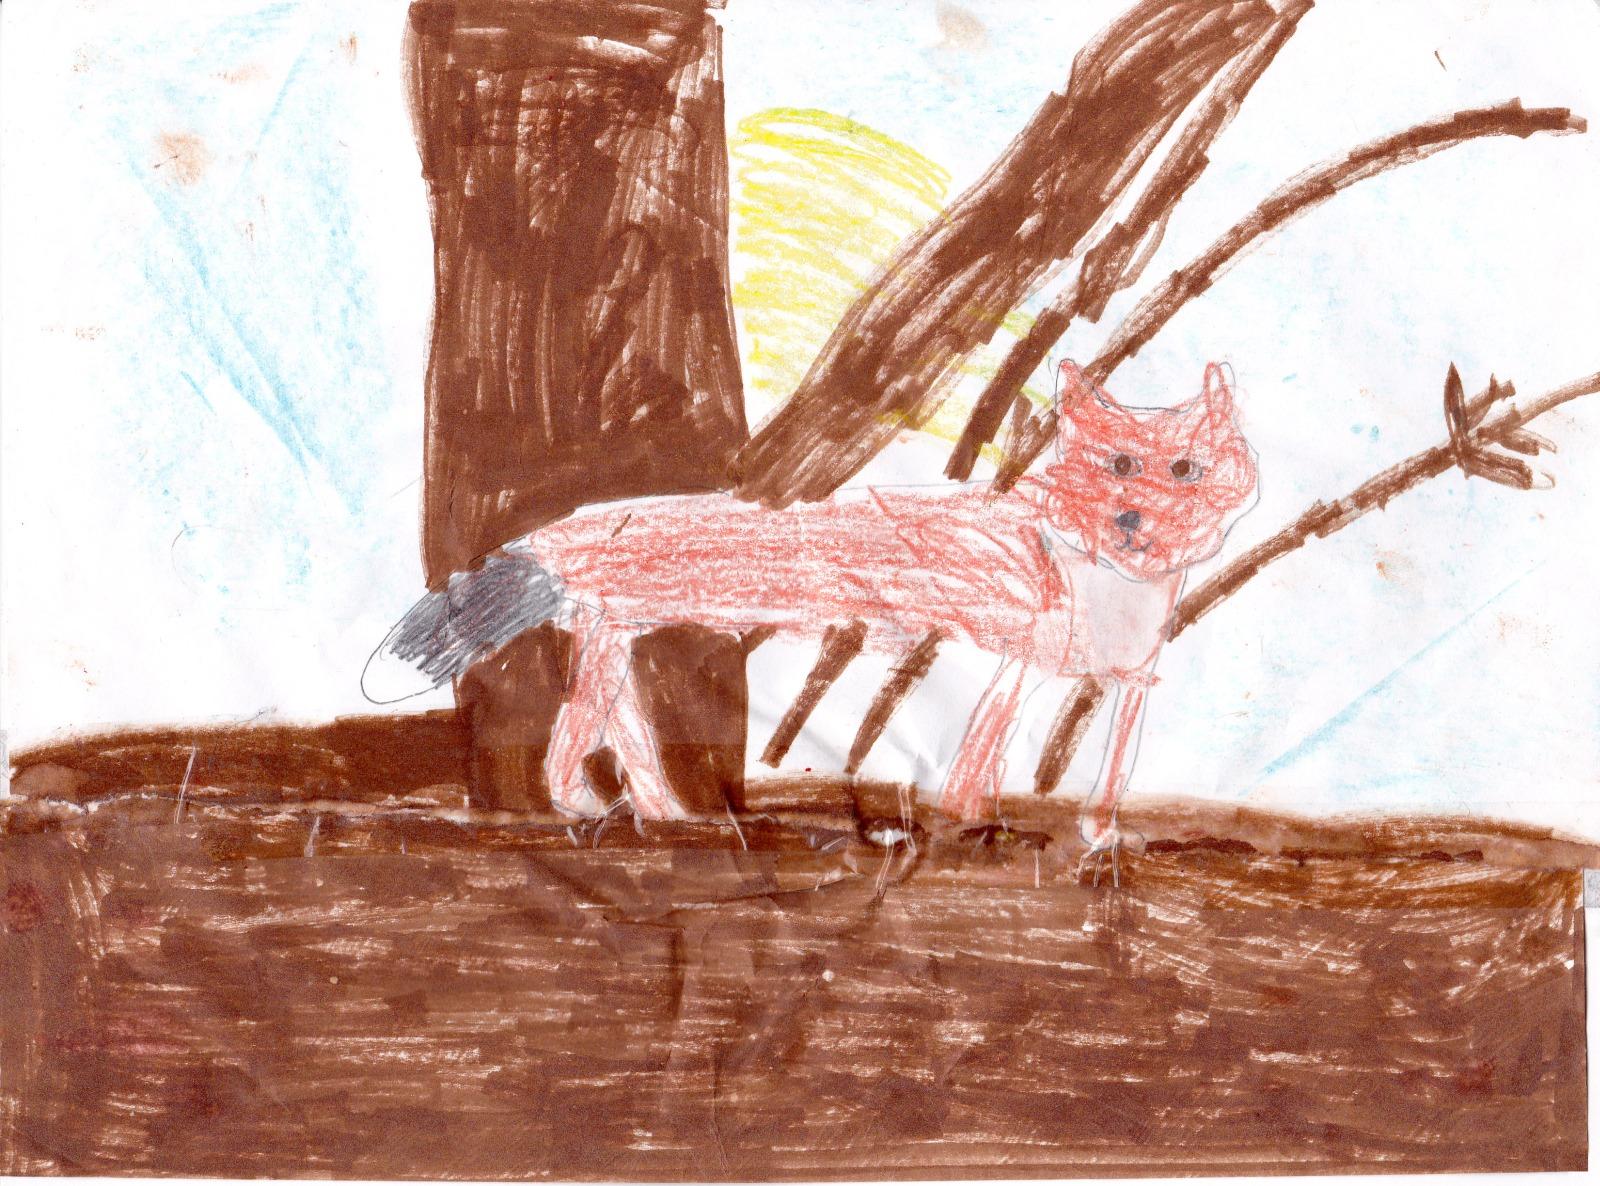 Fox, artwork by Natalie Carlson